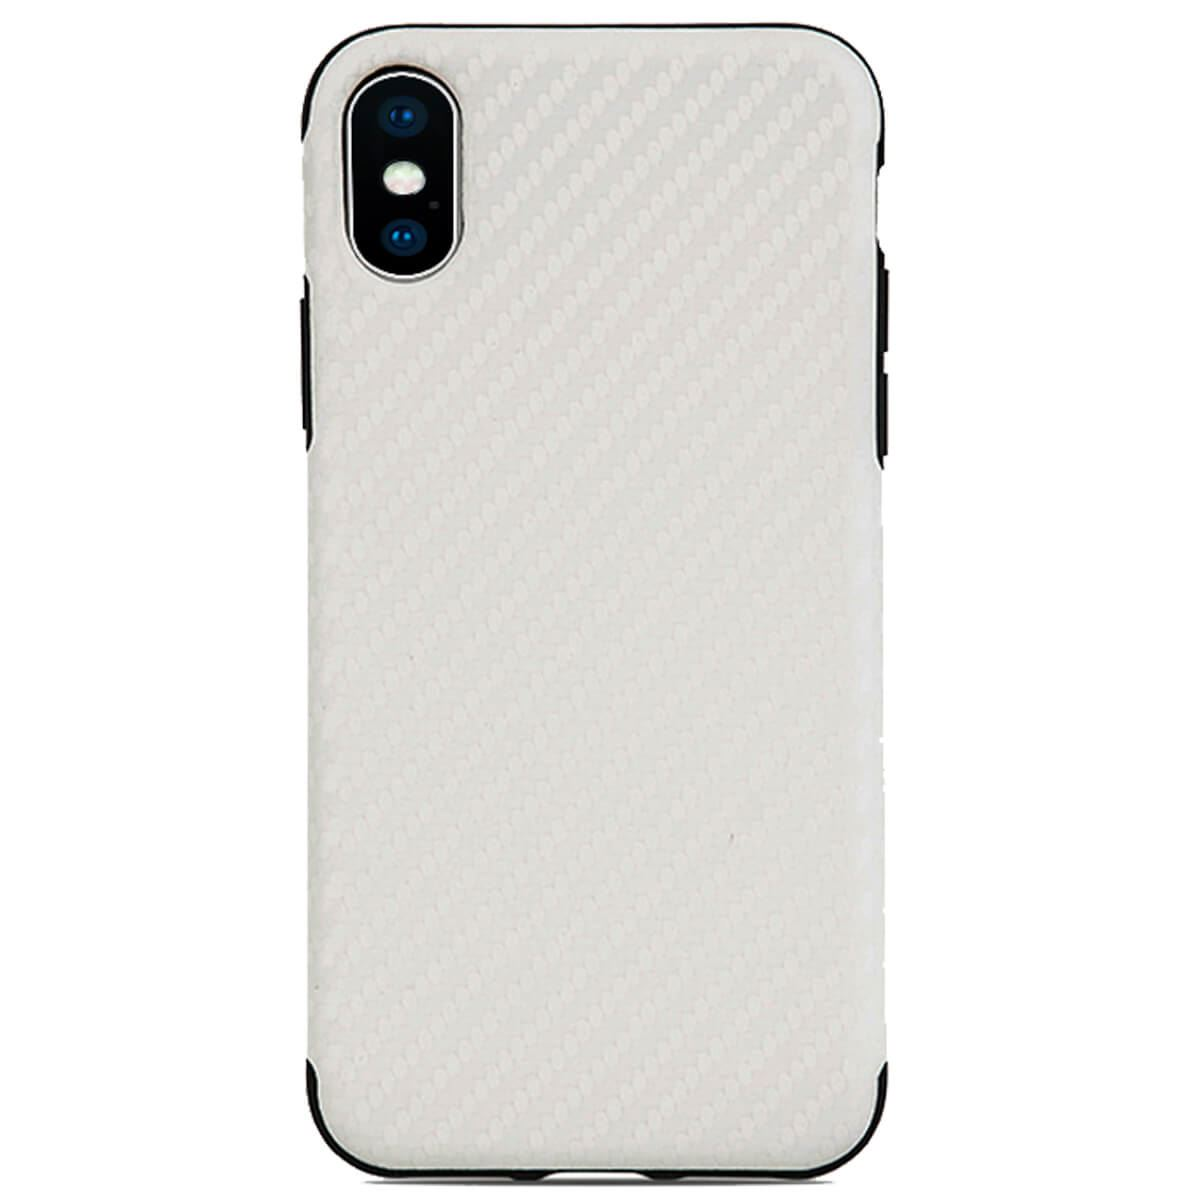 thumbnail 14 - Shockproof Carbon Fibre Case For Apple iPhone 10 X 8 Plus 7 6s Se 5 Thin Cover